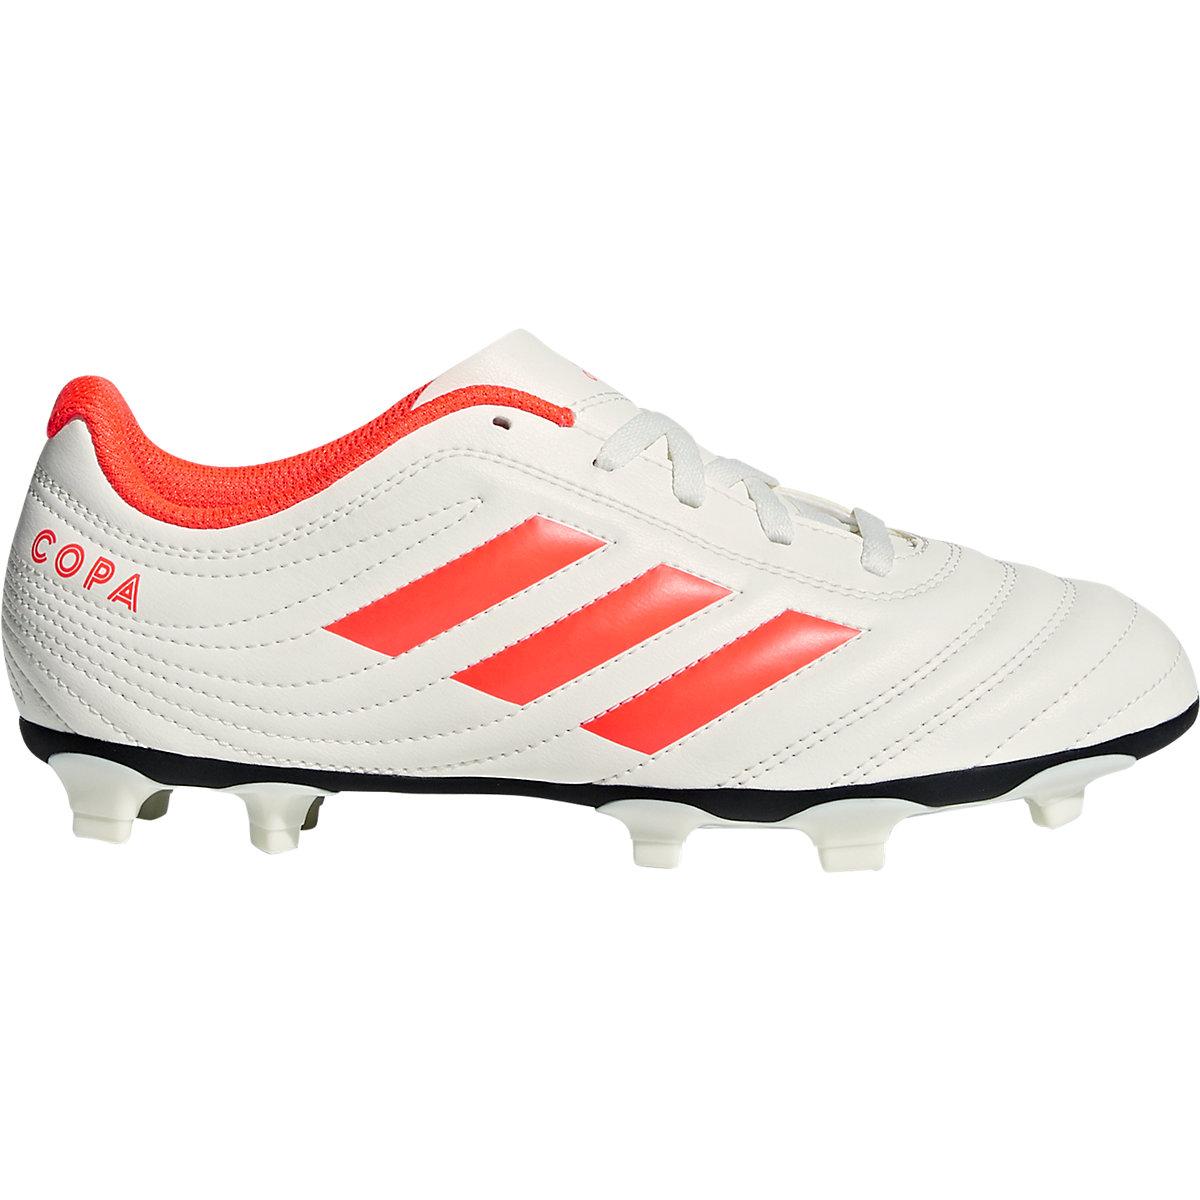 COPA Fußballschuhe Kinder Adidas 19 4 FG A53jq4RcL